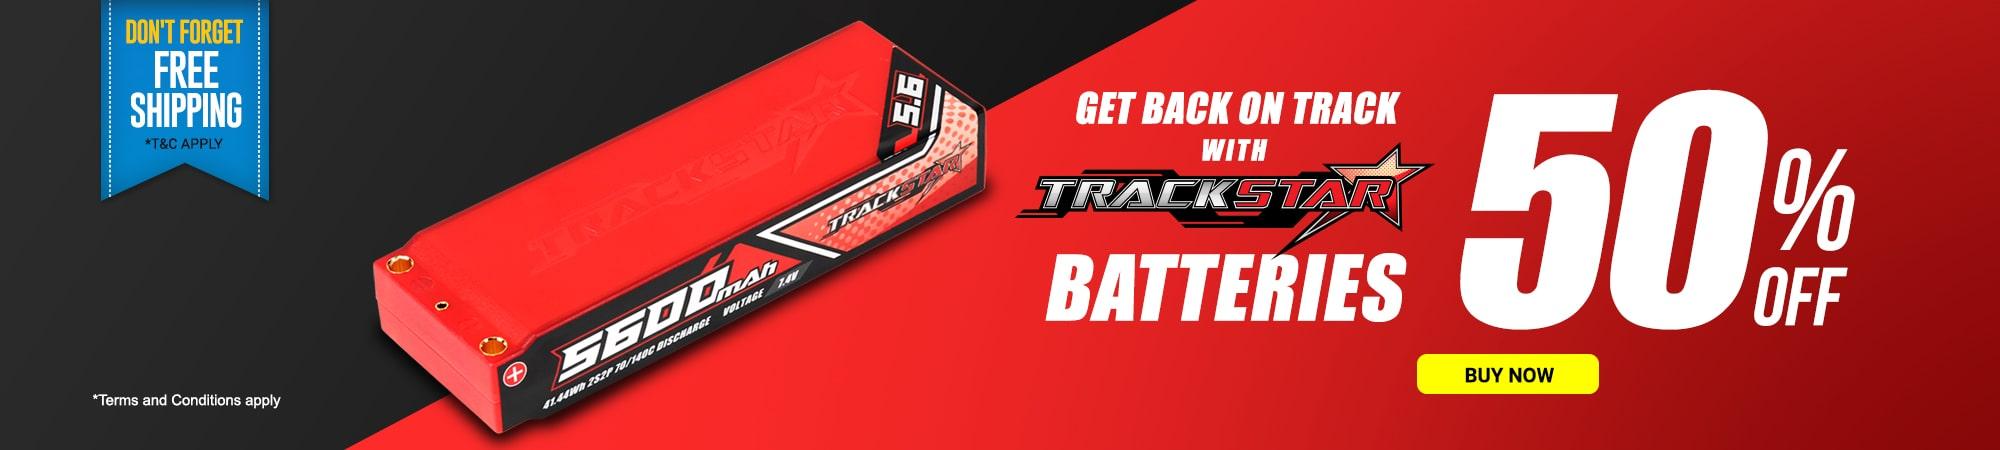 Trackstar Batteries